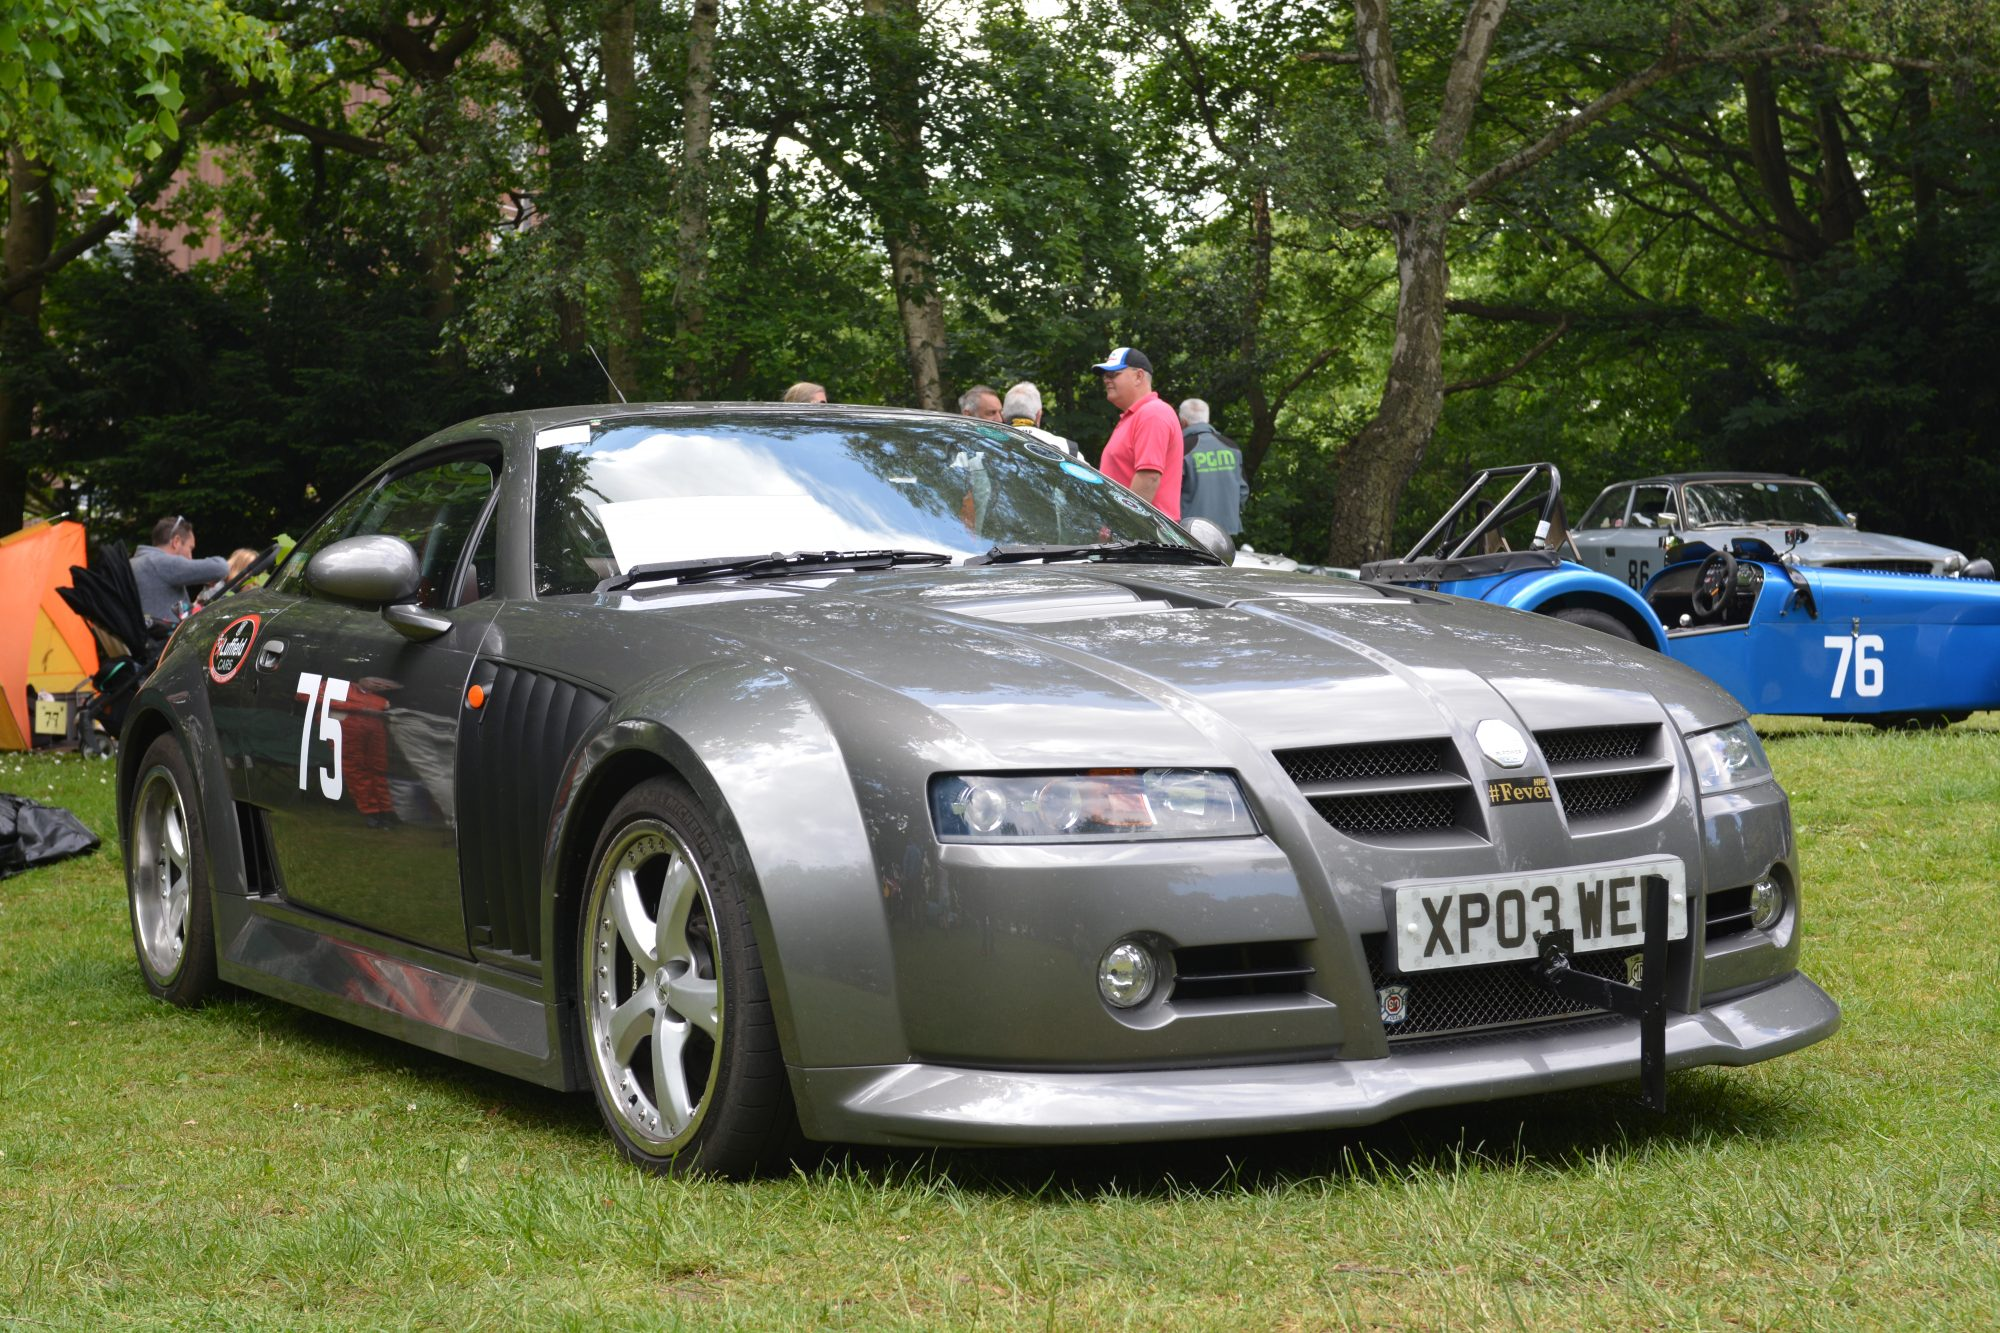 Motorsport, Motorsport at the Palace, Crystal Palace, London car show, classic car, show, classic motorsport, MG SV front